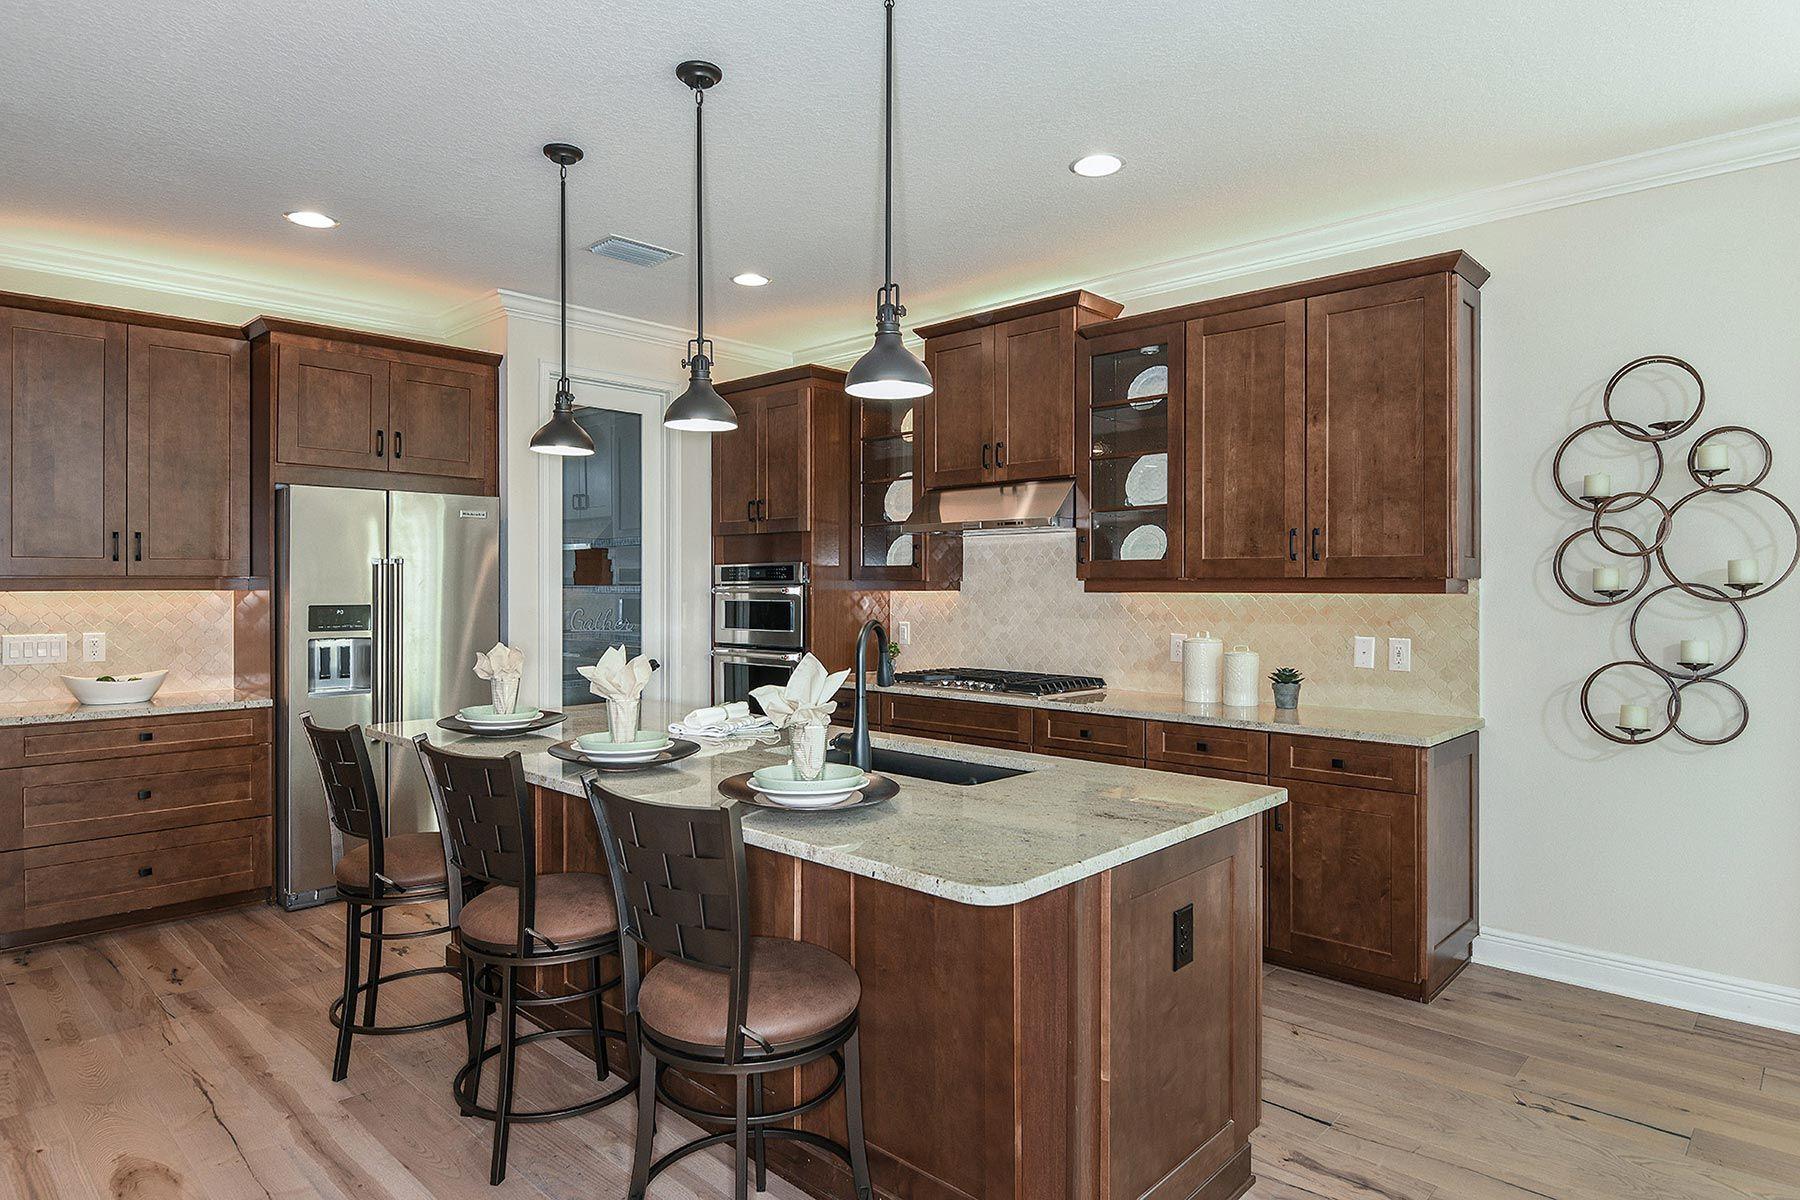 Kitchen featured in the Sunlit By Mattamy Homes in Sarasota-Bradenton, FL